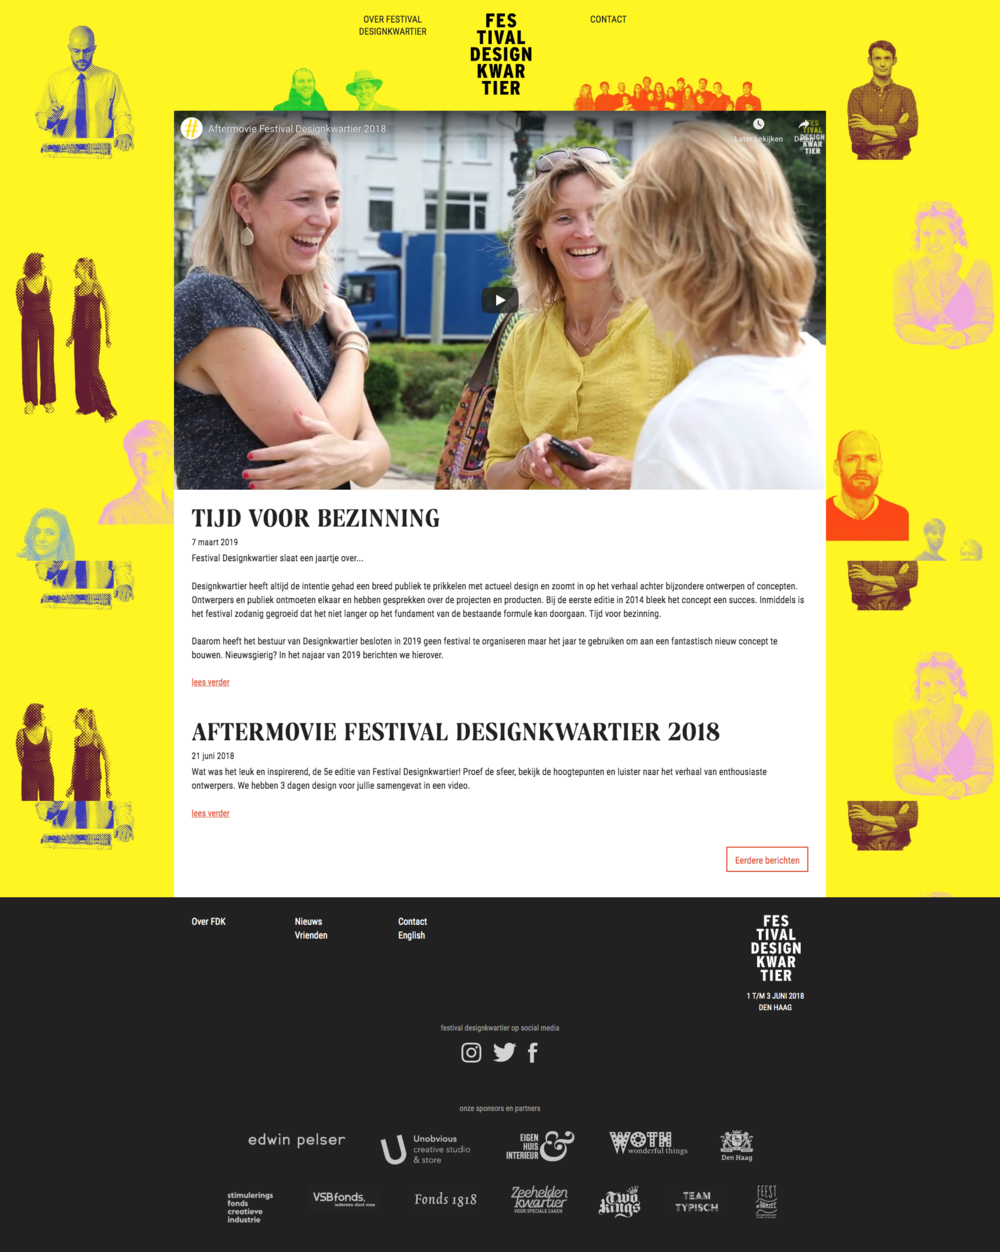 screencapture-festivaldesignkwartier-nl-2019-04-17-16_02_19.png